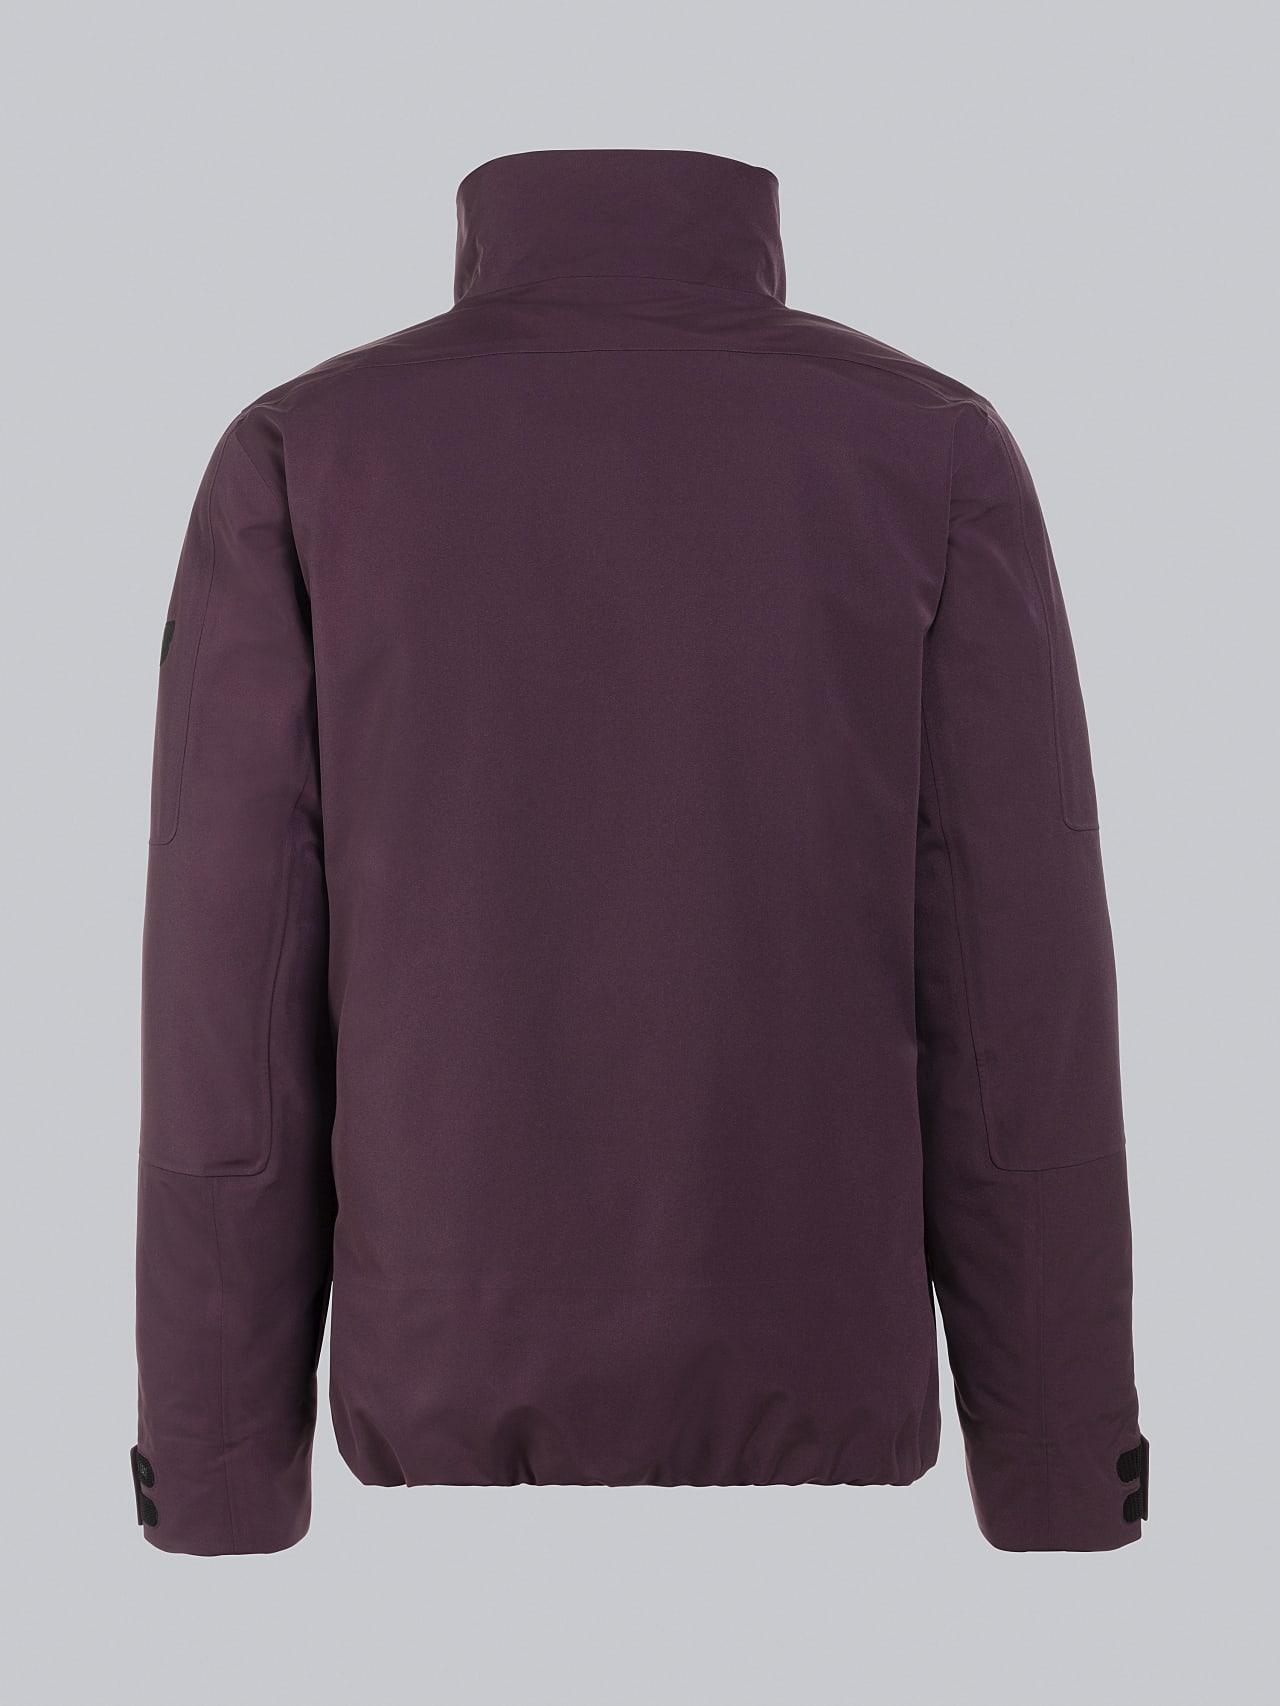 OKOVO V4.Y5.02 Packable and Waterproof Winter Jacket Burgundy Left Alpha Tauri